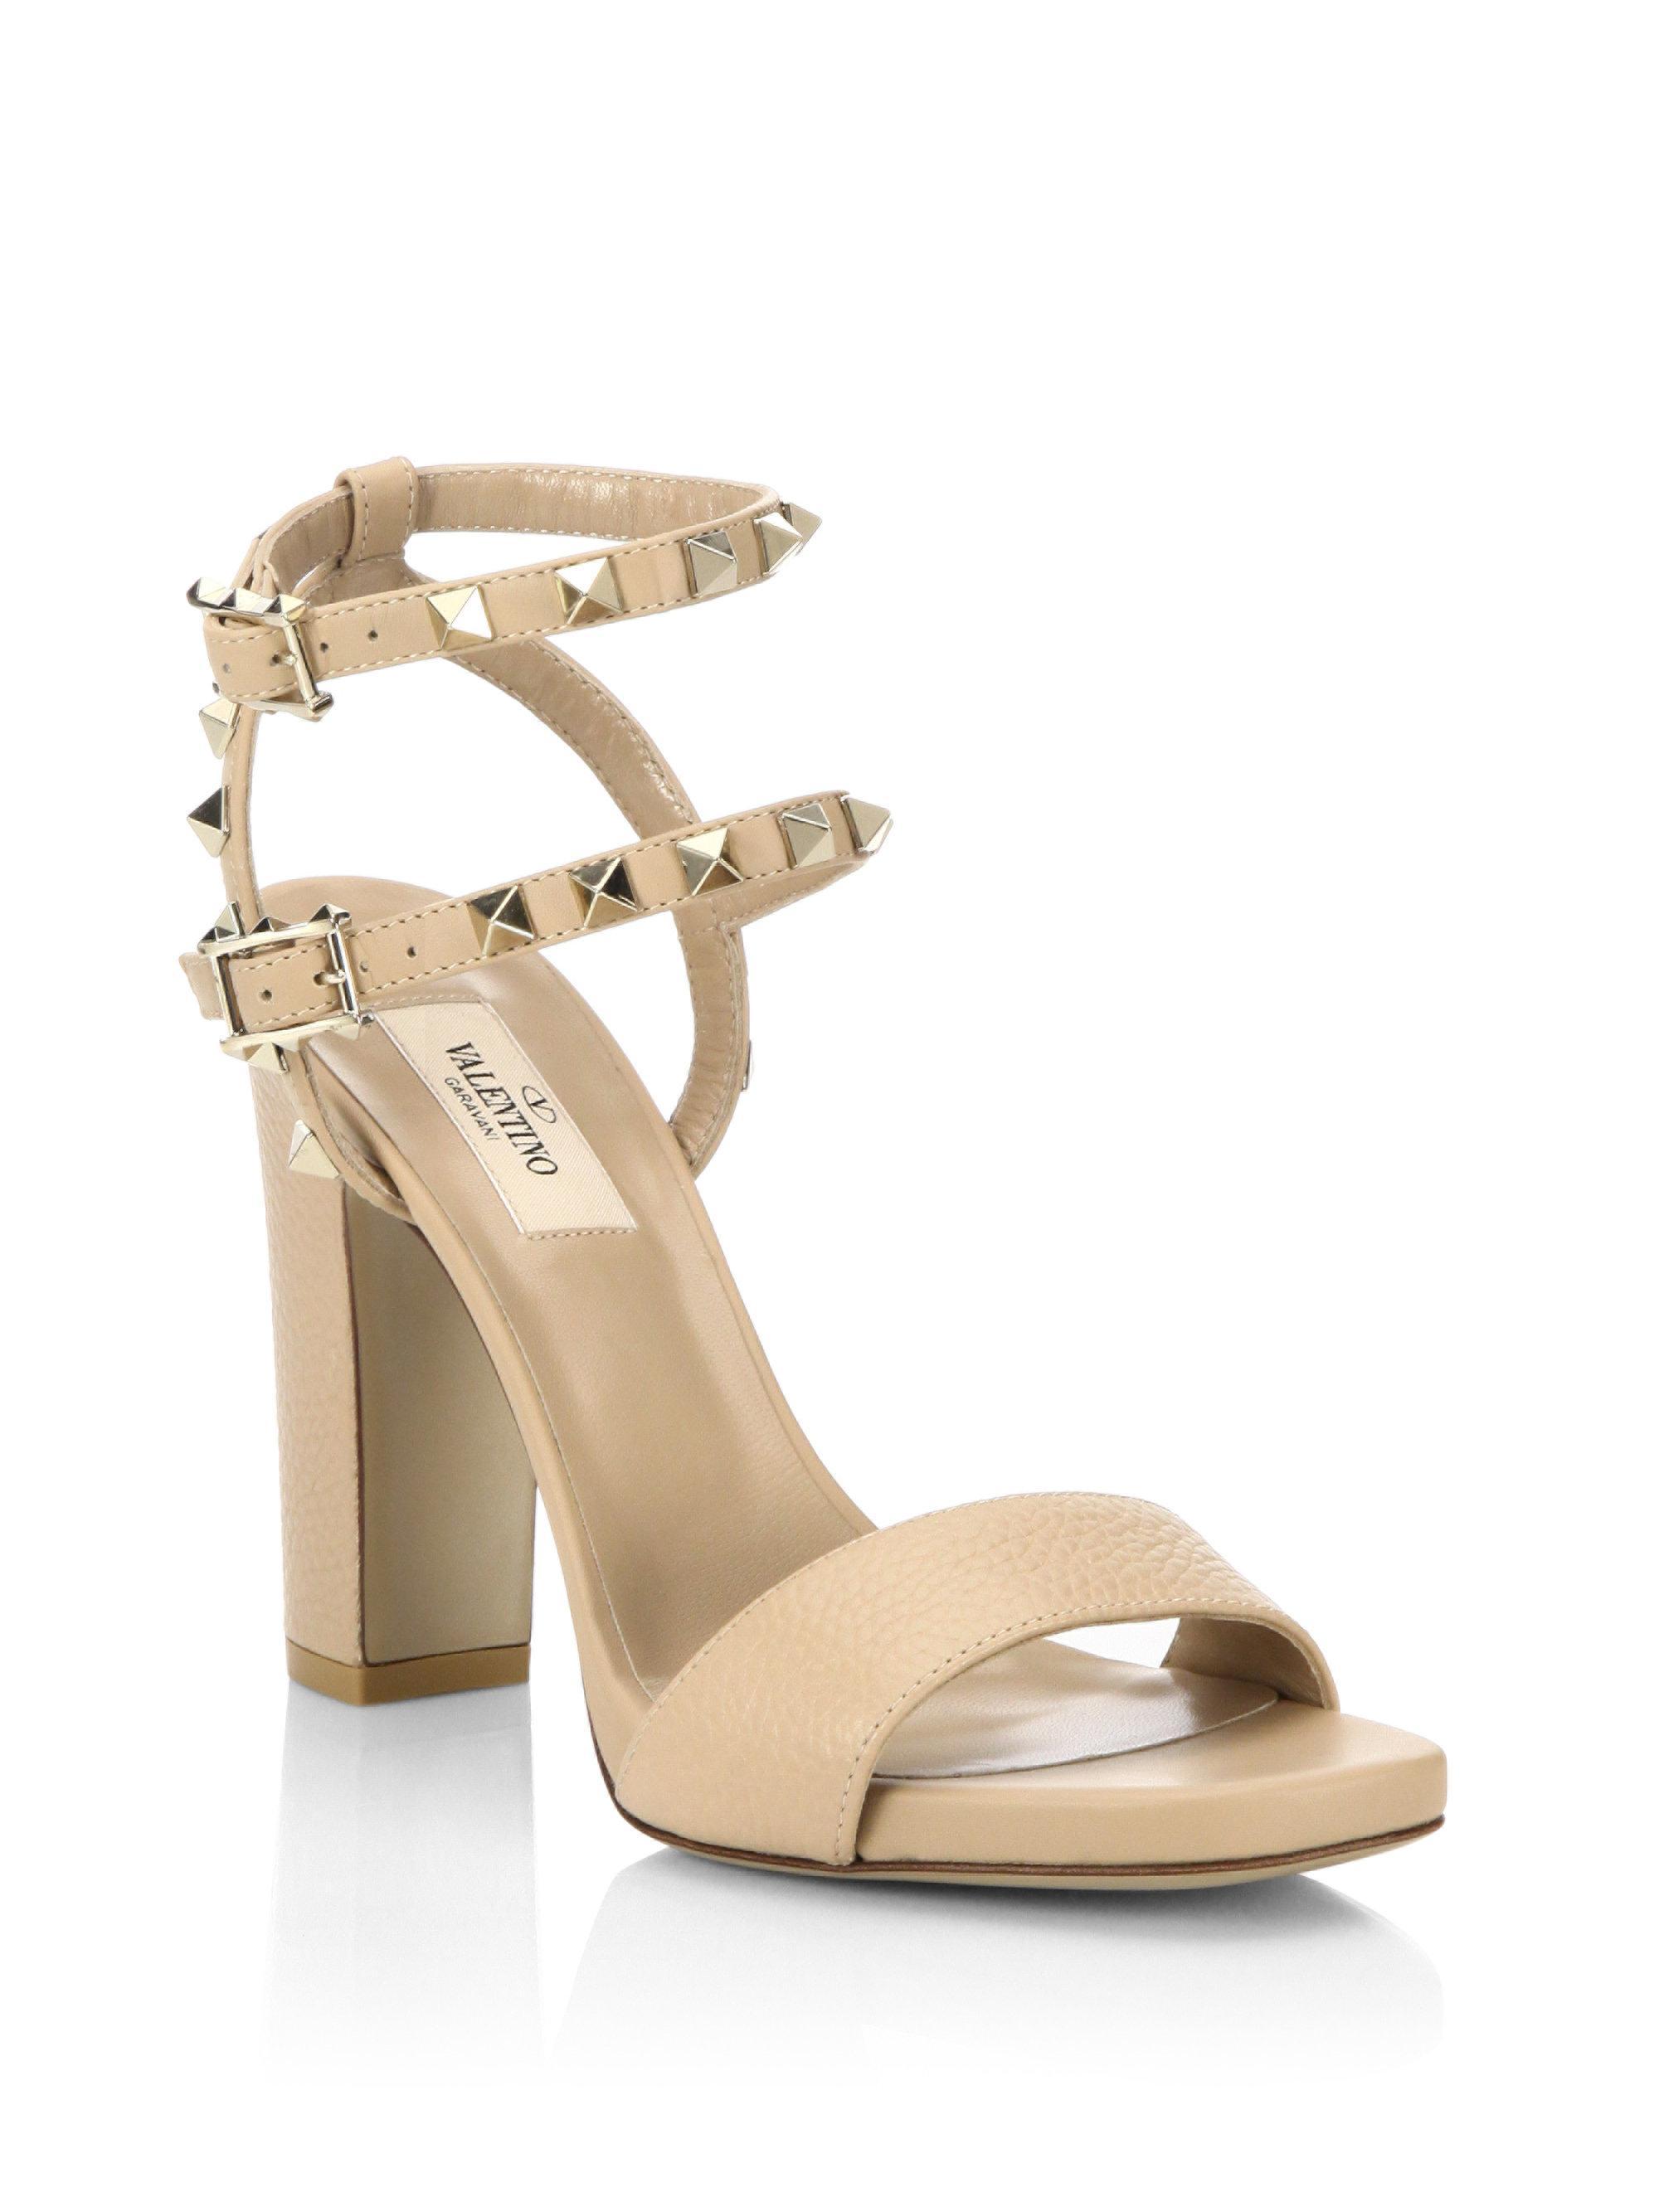 4ef8aa5edf16 Valentino Rockstud High Heel Sandals in Natural - Lyst